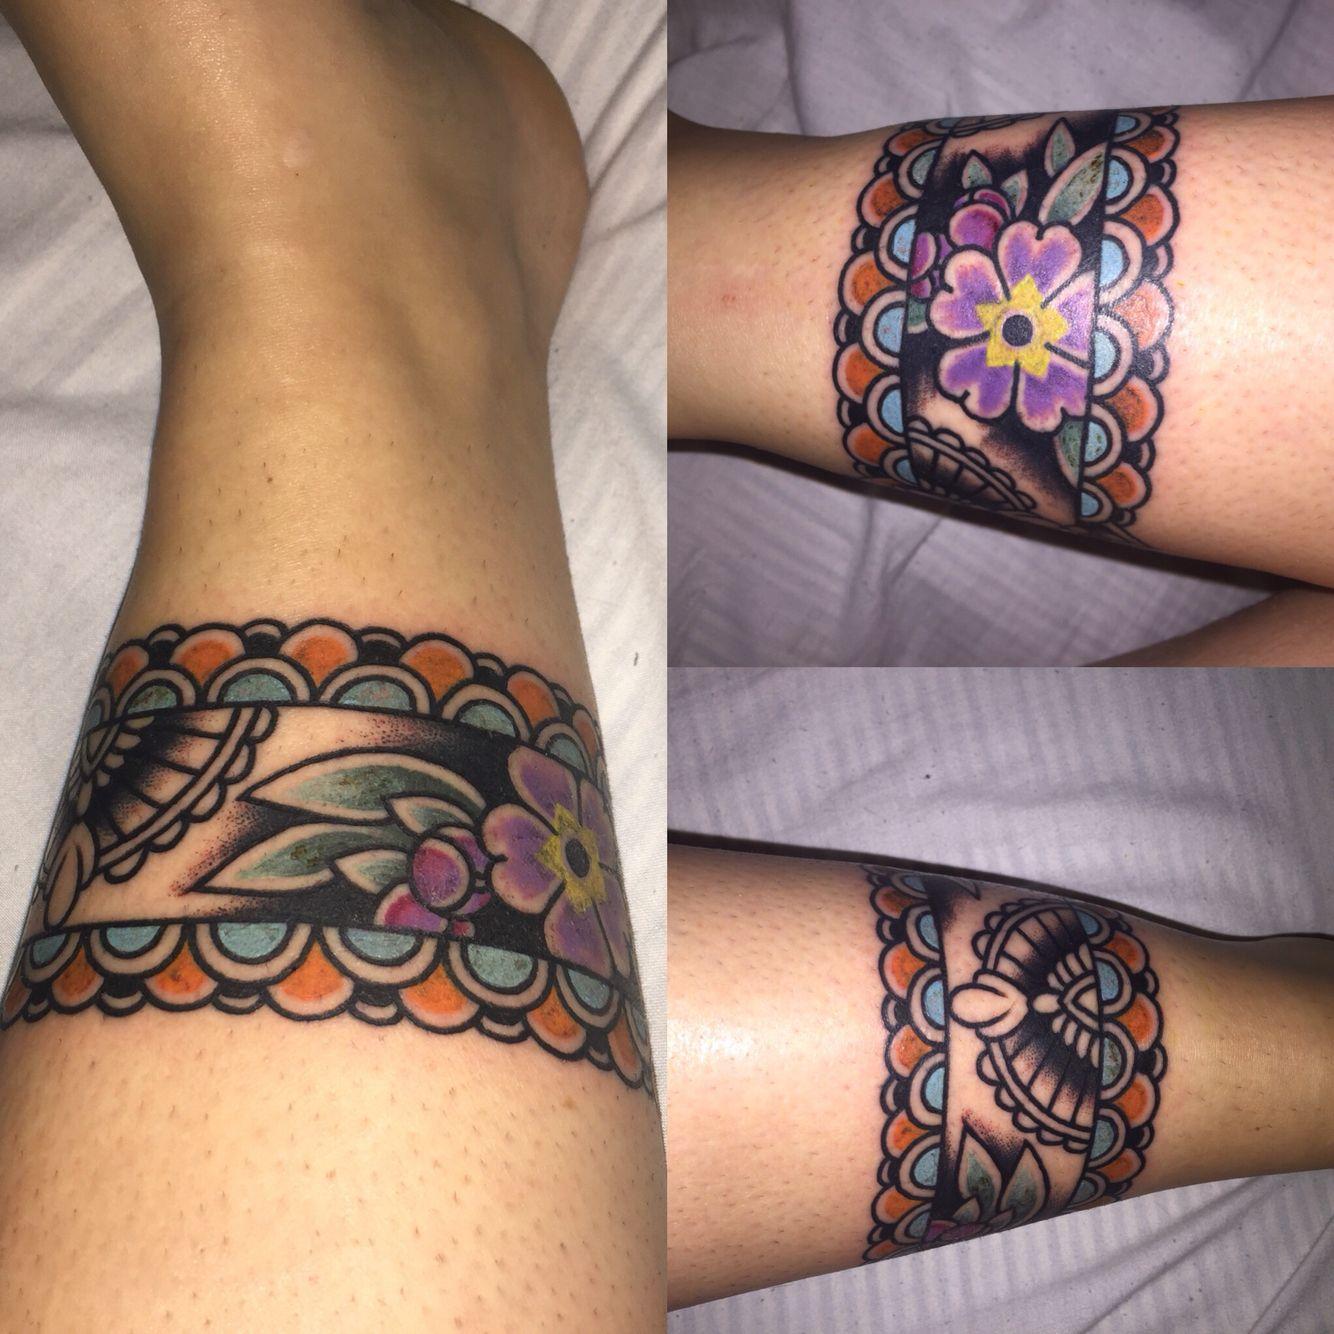 Colourful Ankle Band Tattoo Ankle Band Tattoo Cuff Tattoo Life Tattoos